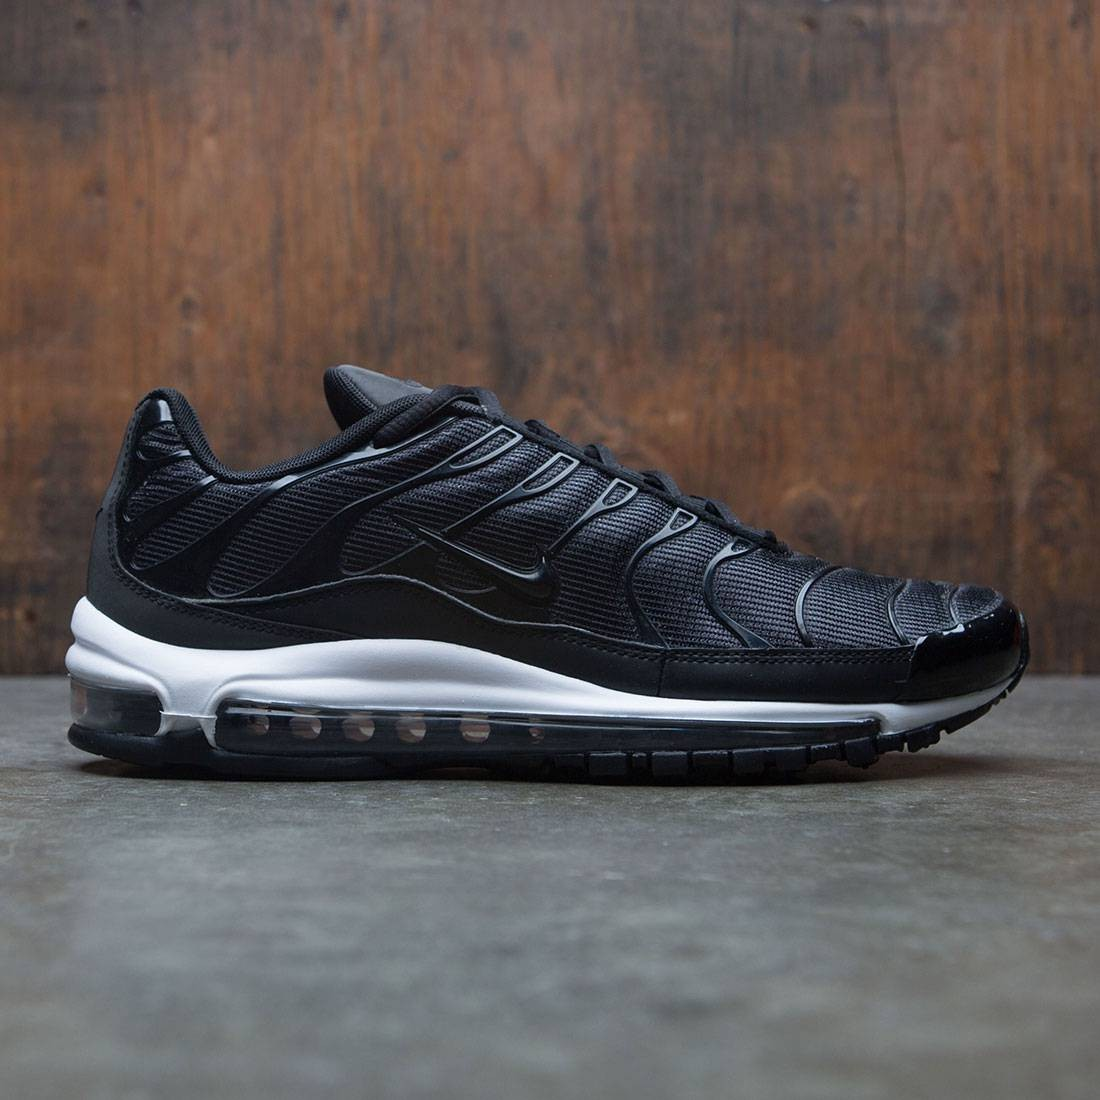 939fd5170114 Nike Air Max 97 Silver Bullet Patta supreme Depop